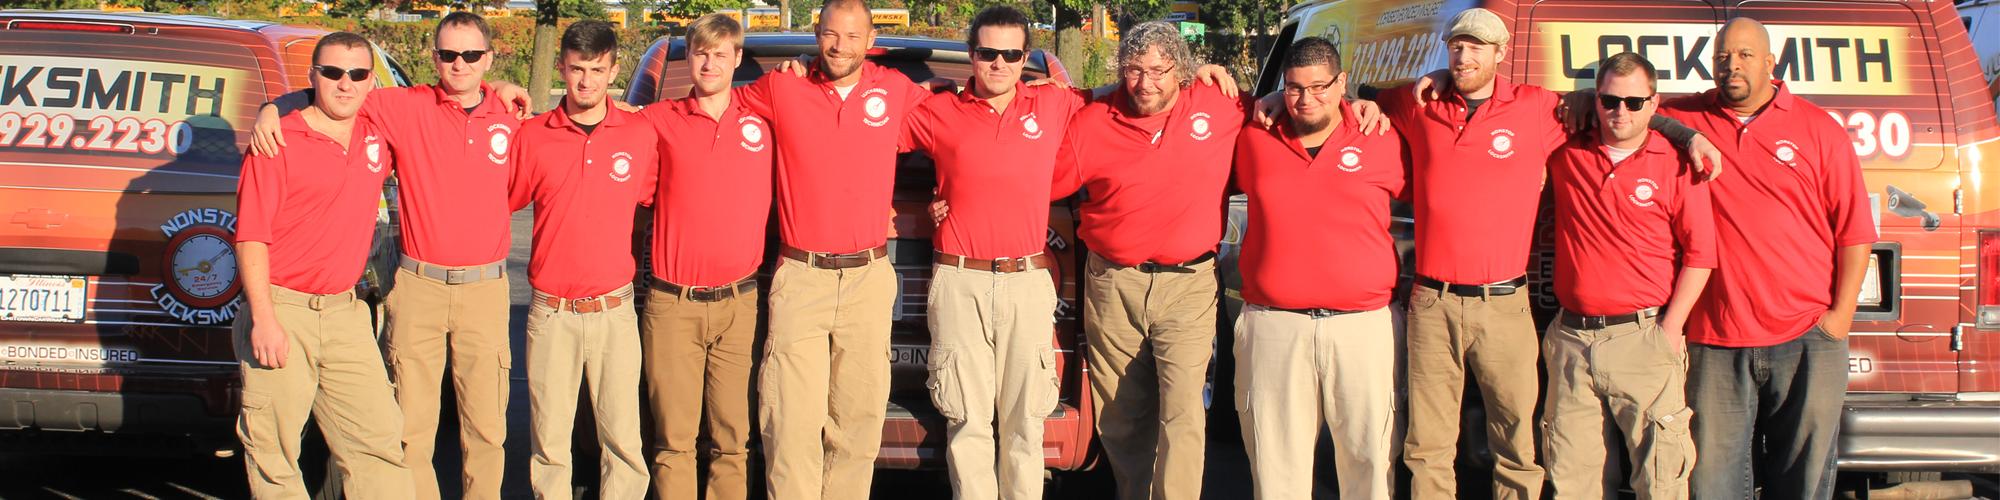 Dedicated Team of Locksmith Professionals